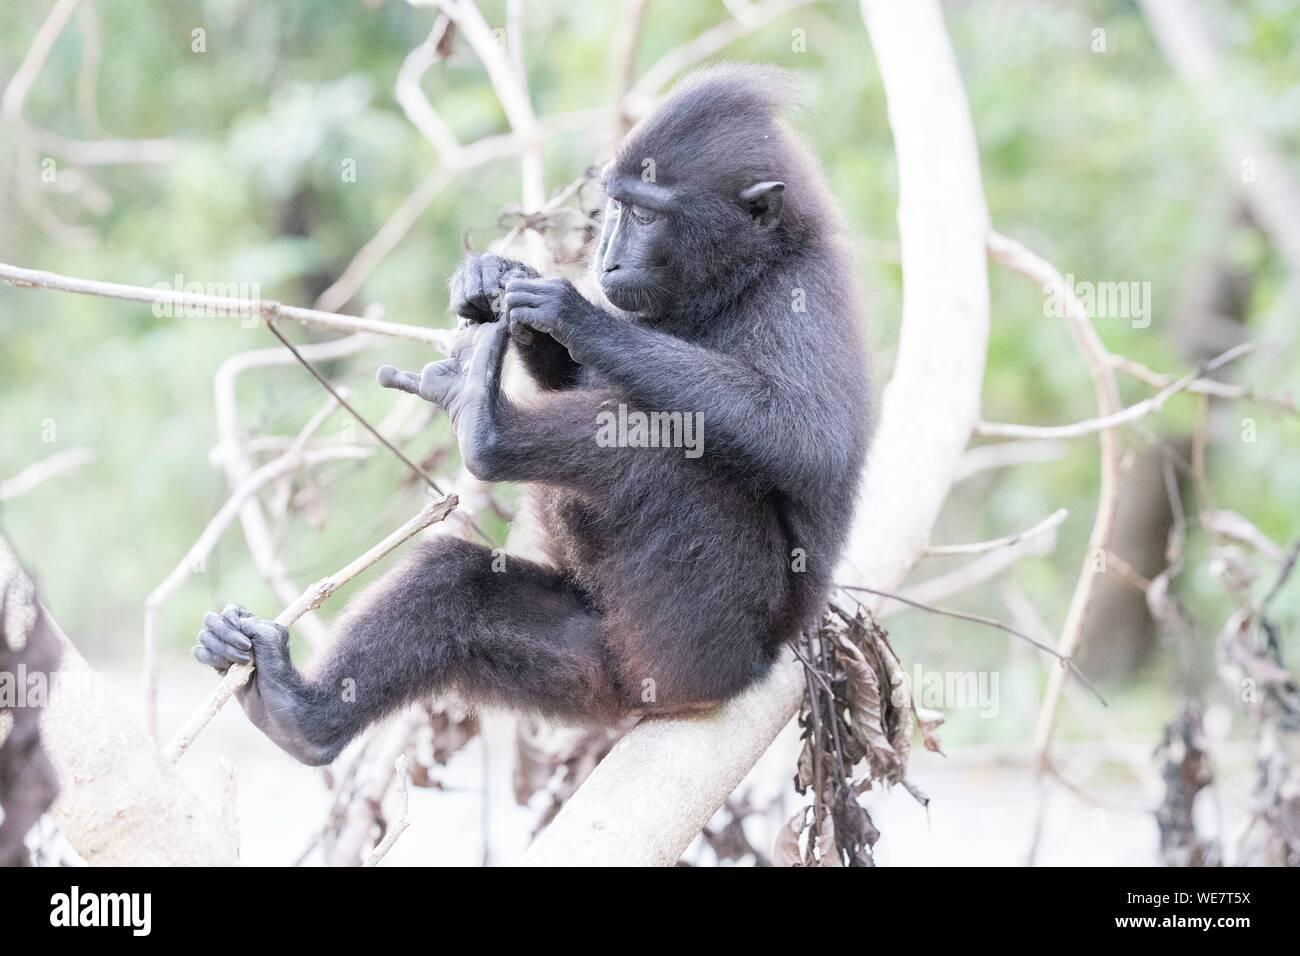 Indonesia, Celebes, Sulawesi, Tangkoko National Park, Celebes crested macaque or crested black macaque, Sulawesi crested macaque, or the black ape (Macaca nigra) Stock Photo